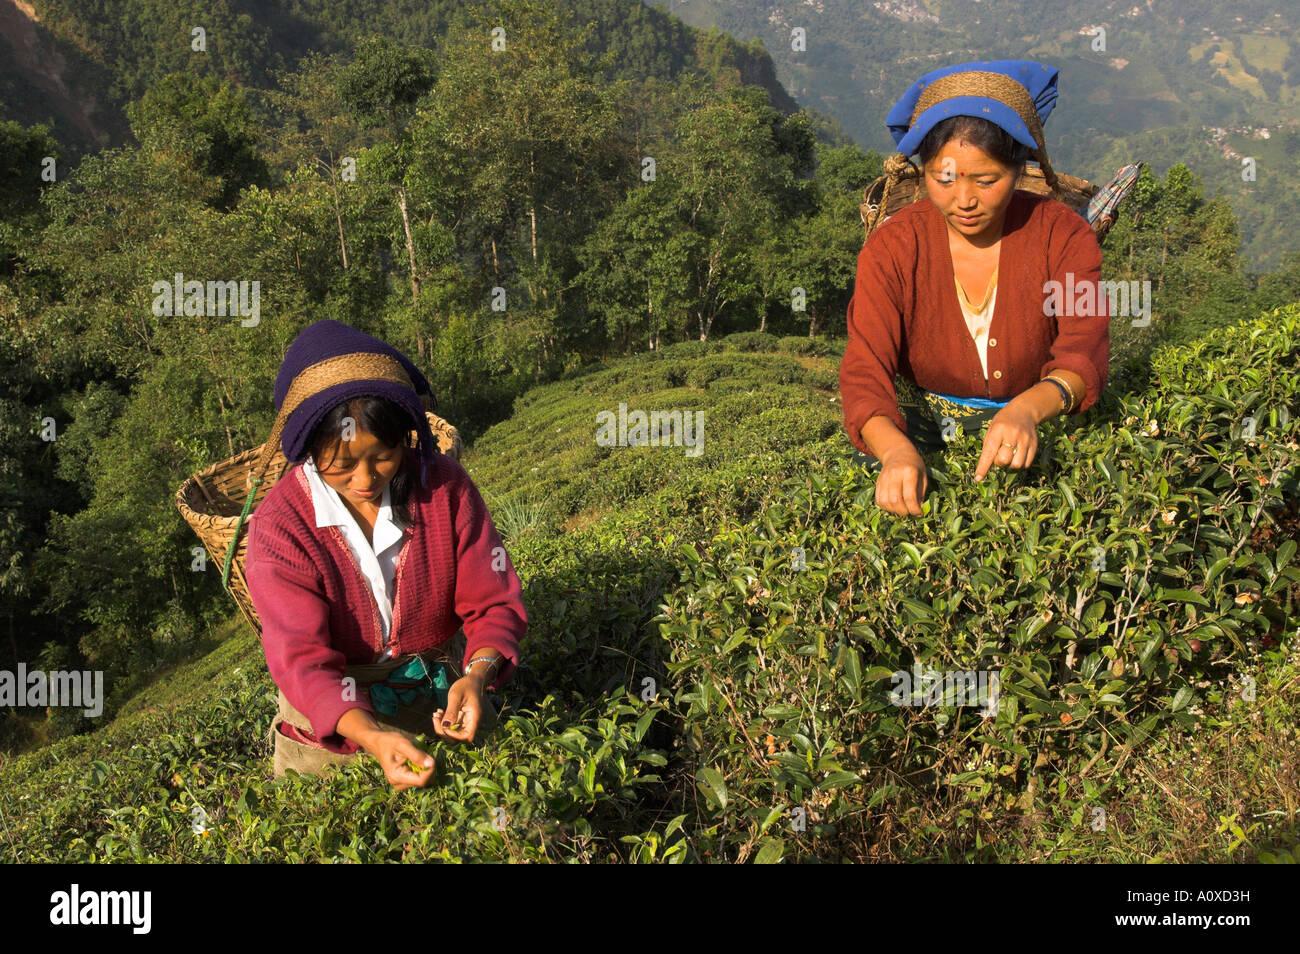 India West Bengal Himalaya Range Darjeeling Singtom Tea Garden Women Stock Photo Royalty Free